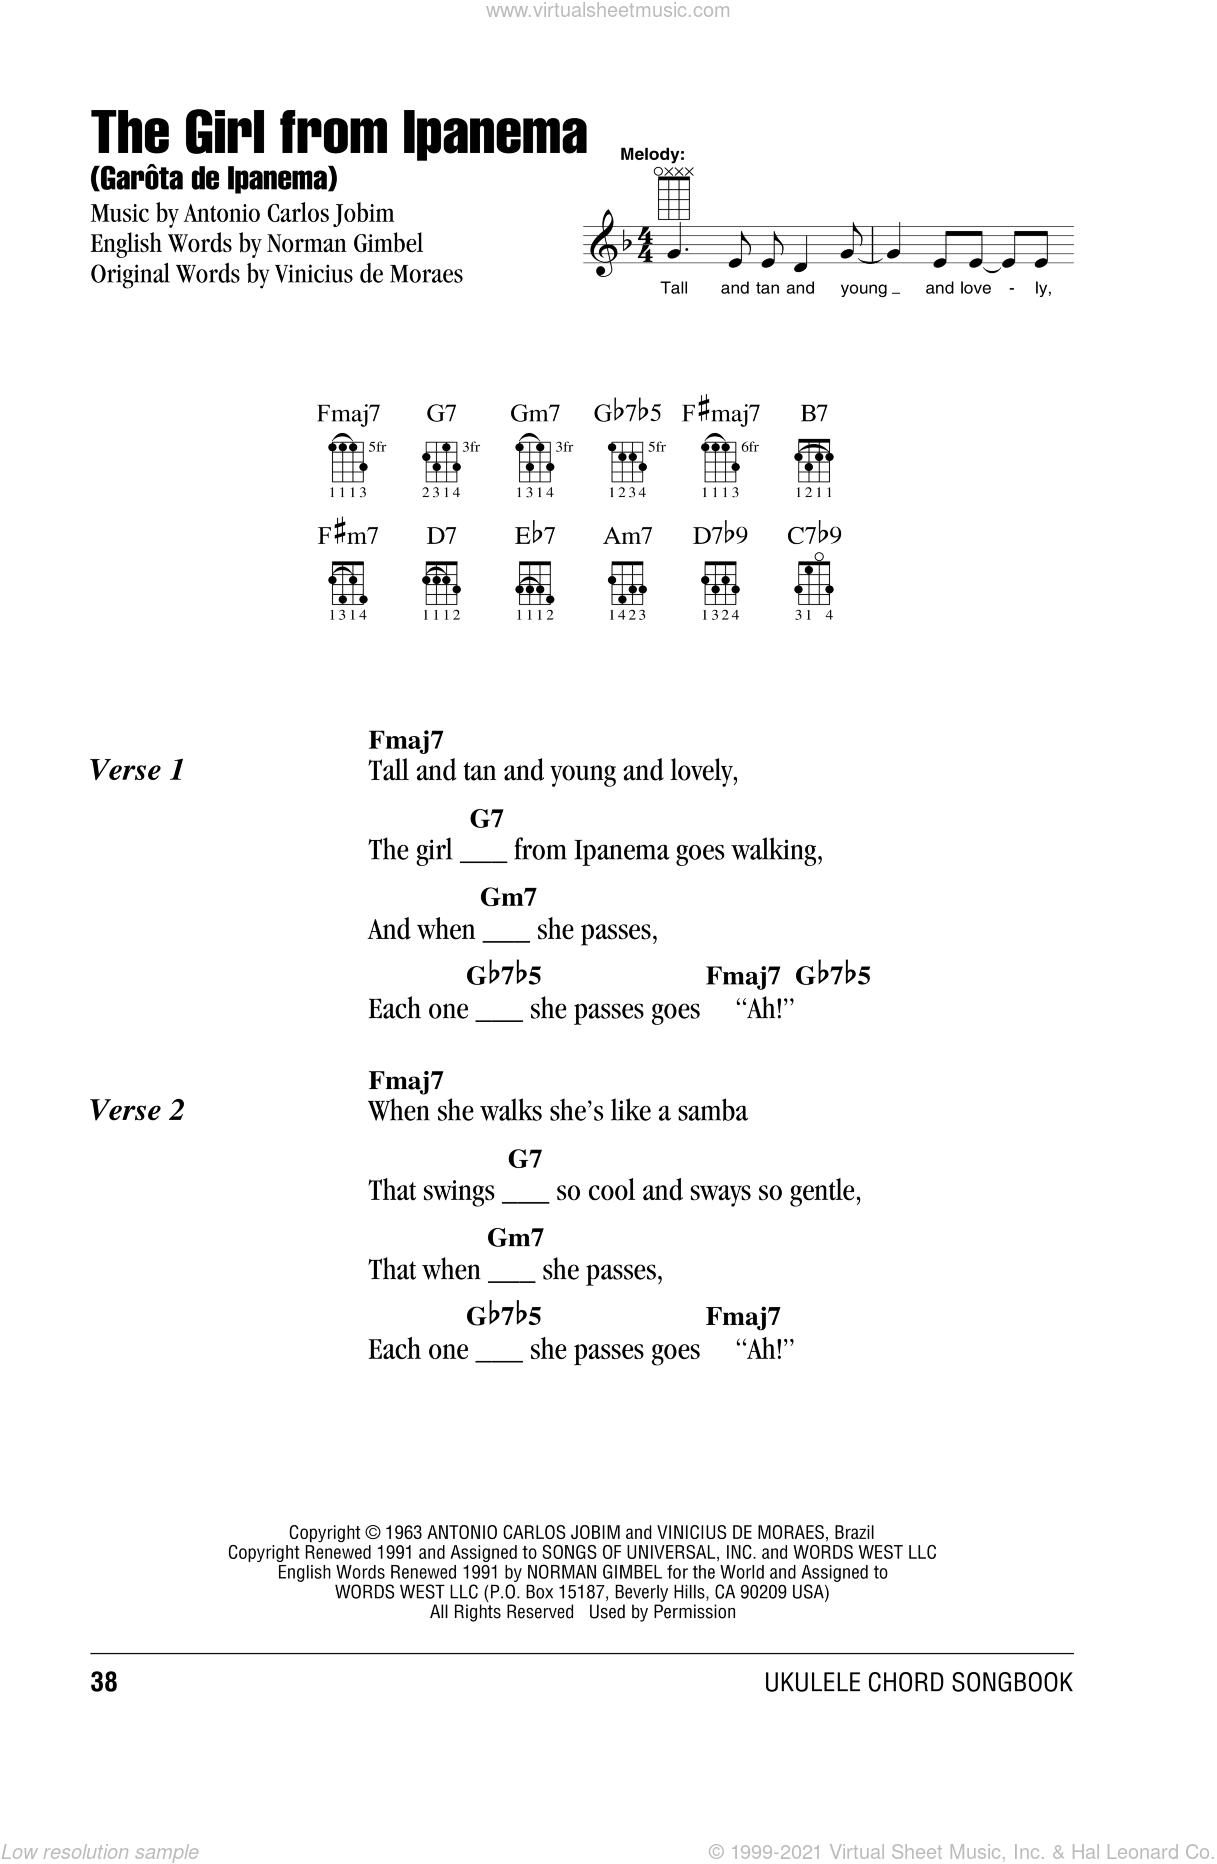 The Girl From Ipanema (GarA'ta De Ipanema) sheet music for ukulele (chords) by Antonio Carlos Jobim and Stan Getz & Astrud Gilberto, intermediate skill level